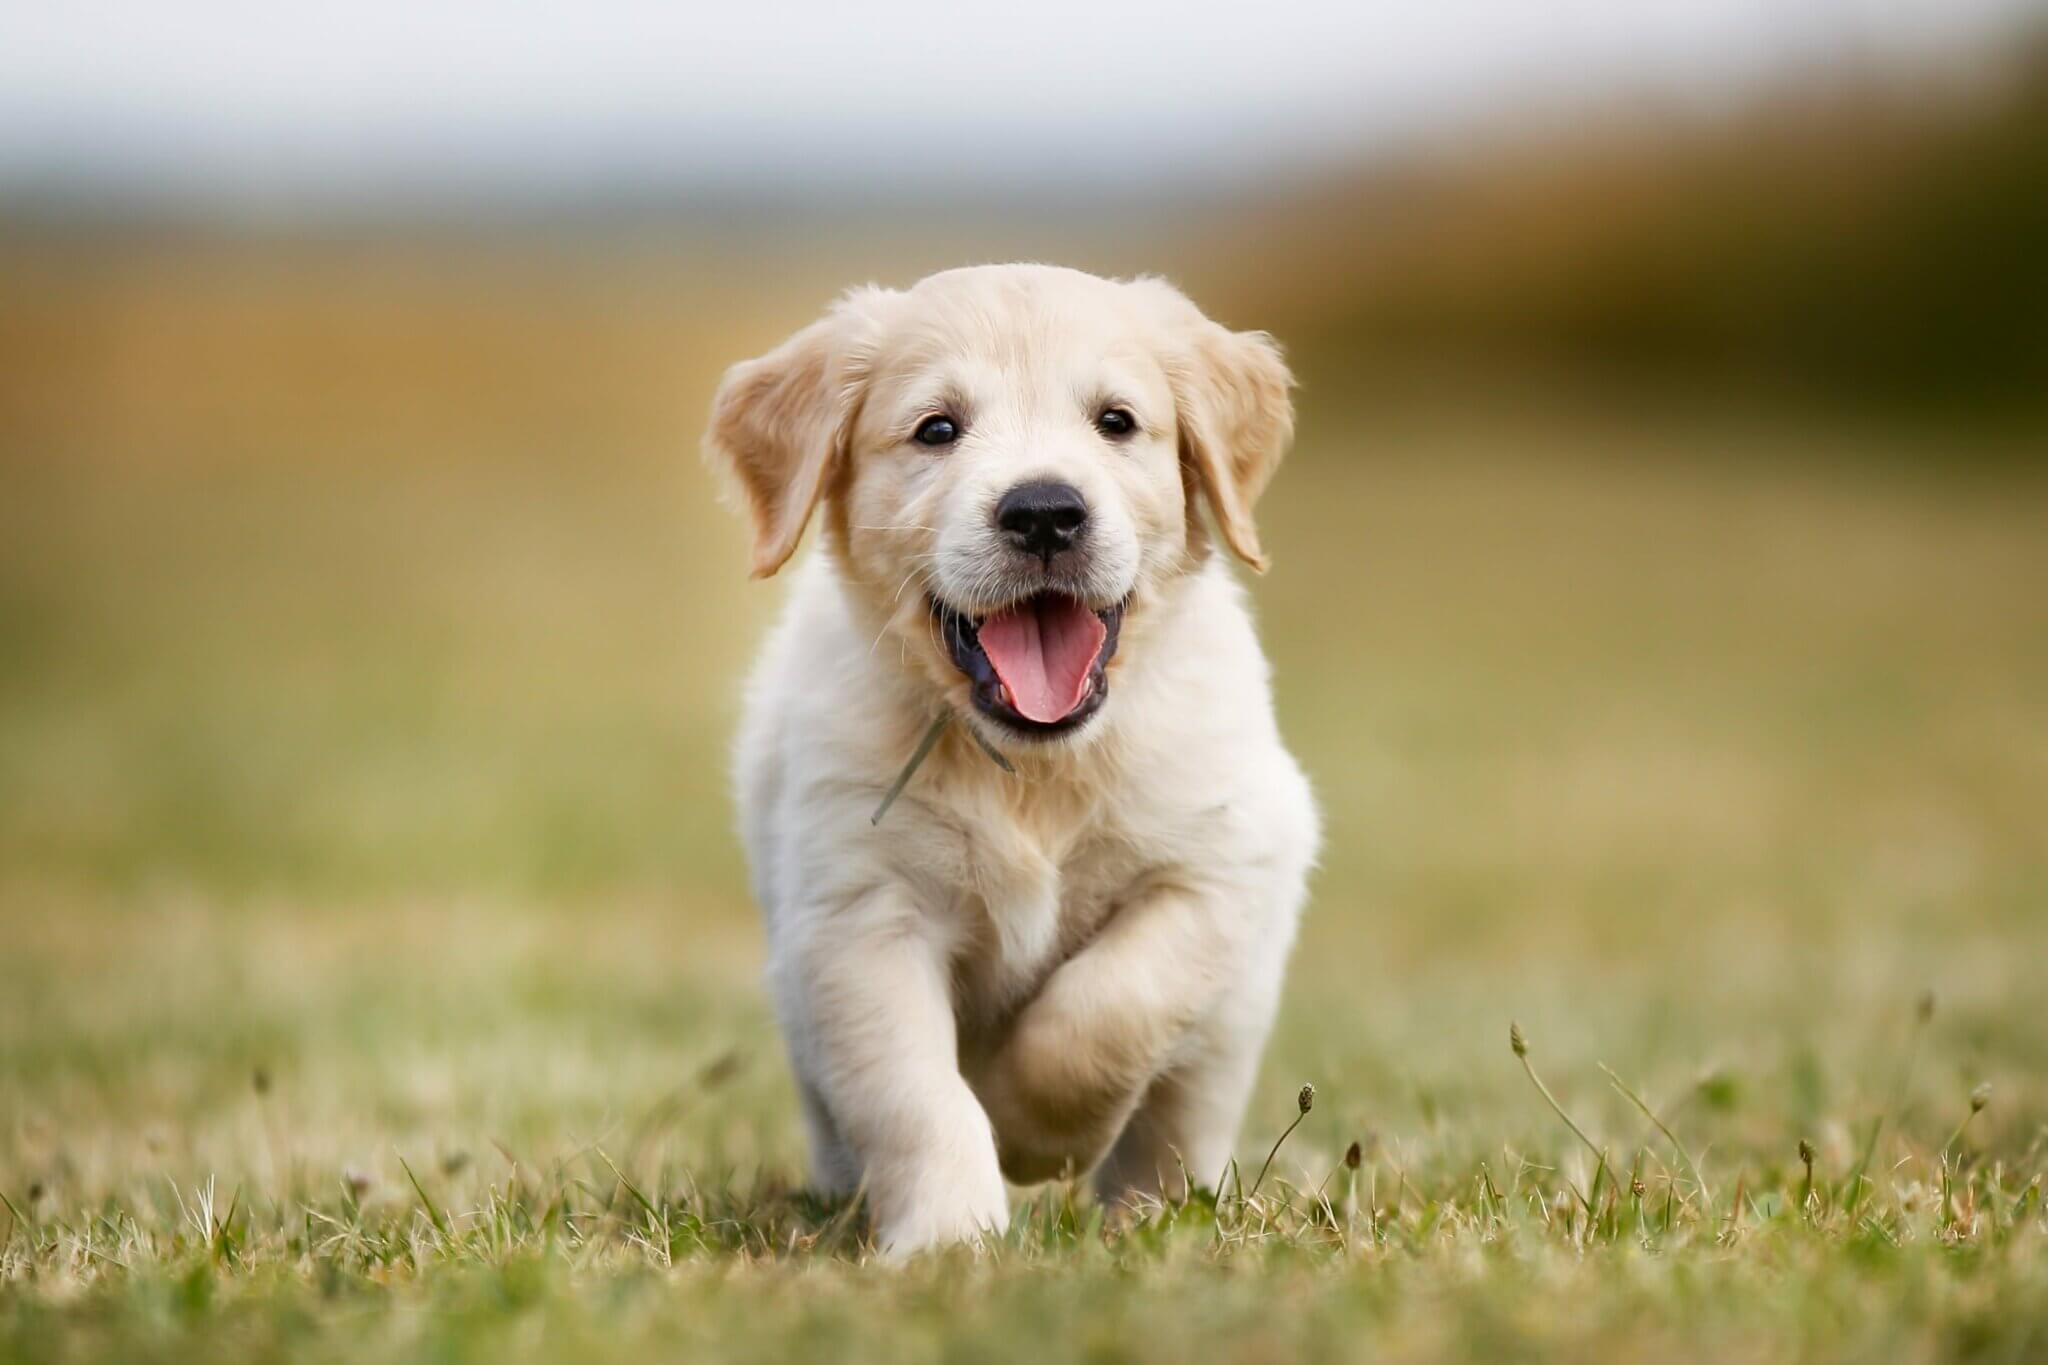 koşan yavru köpek